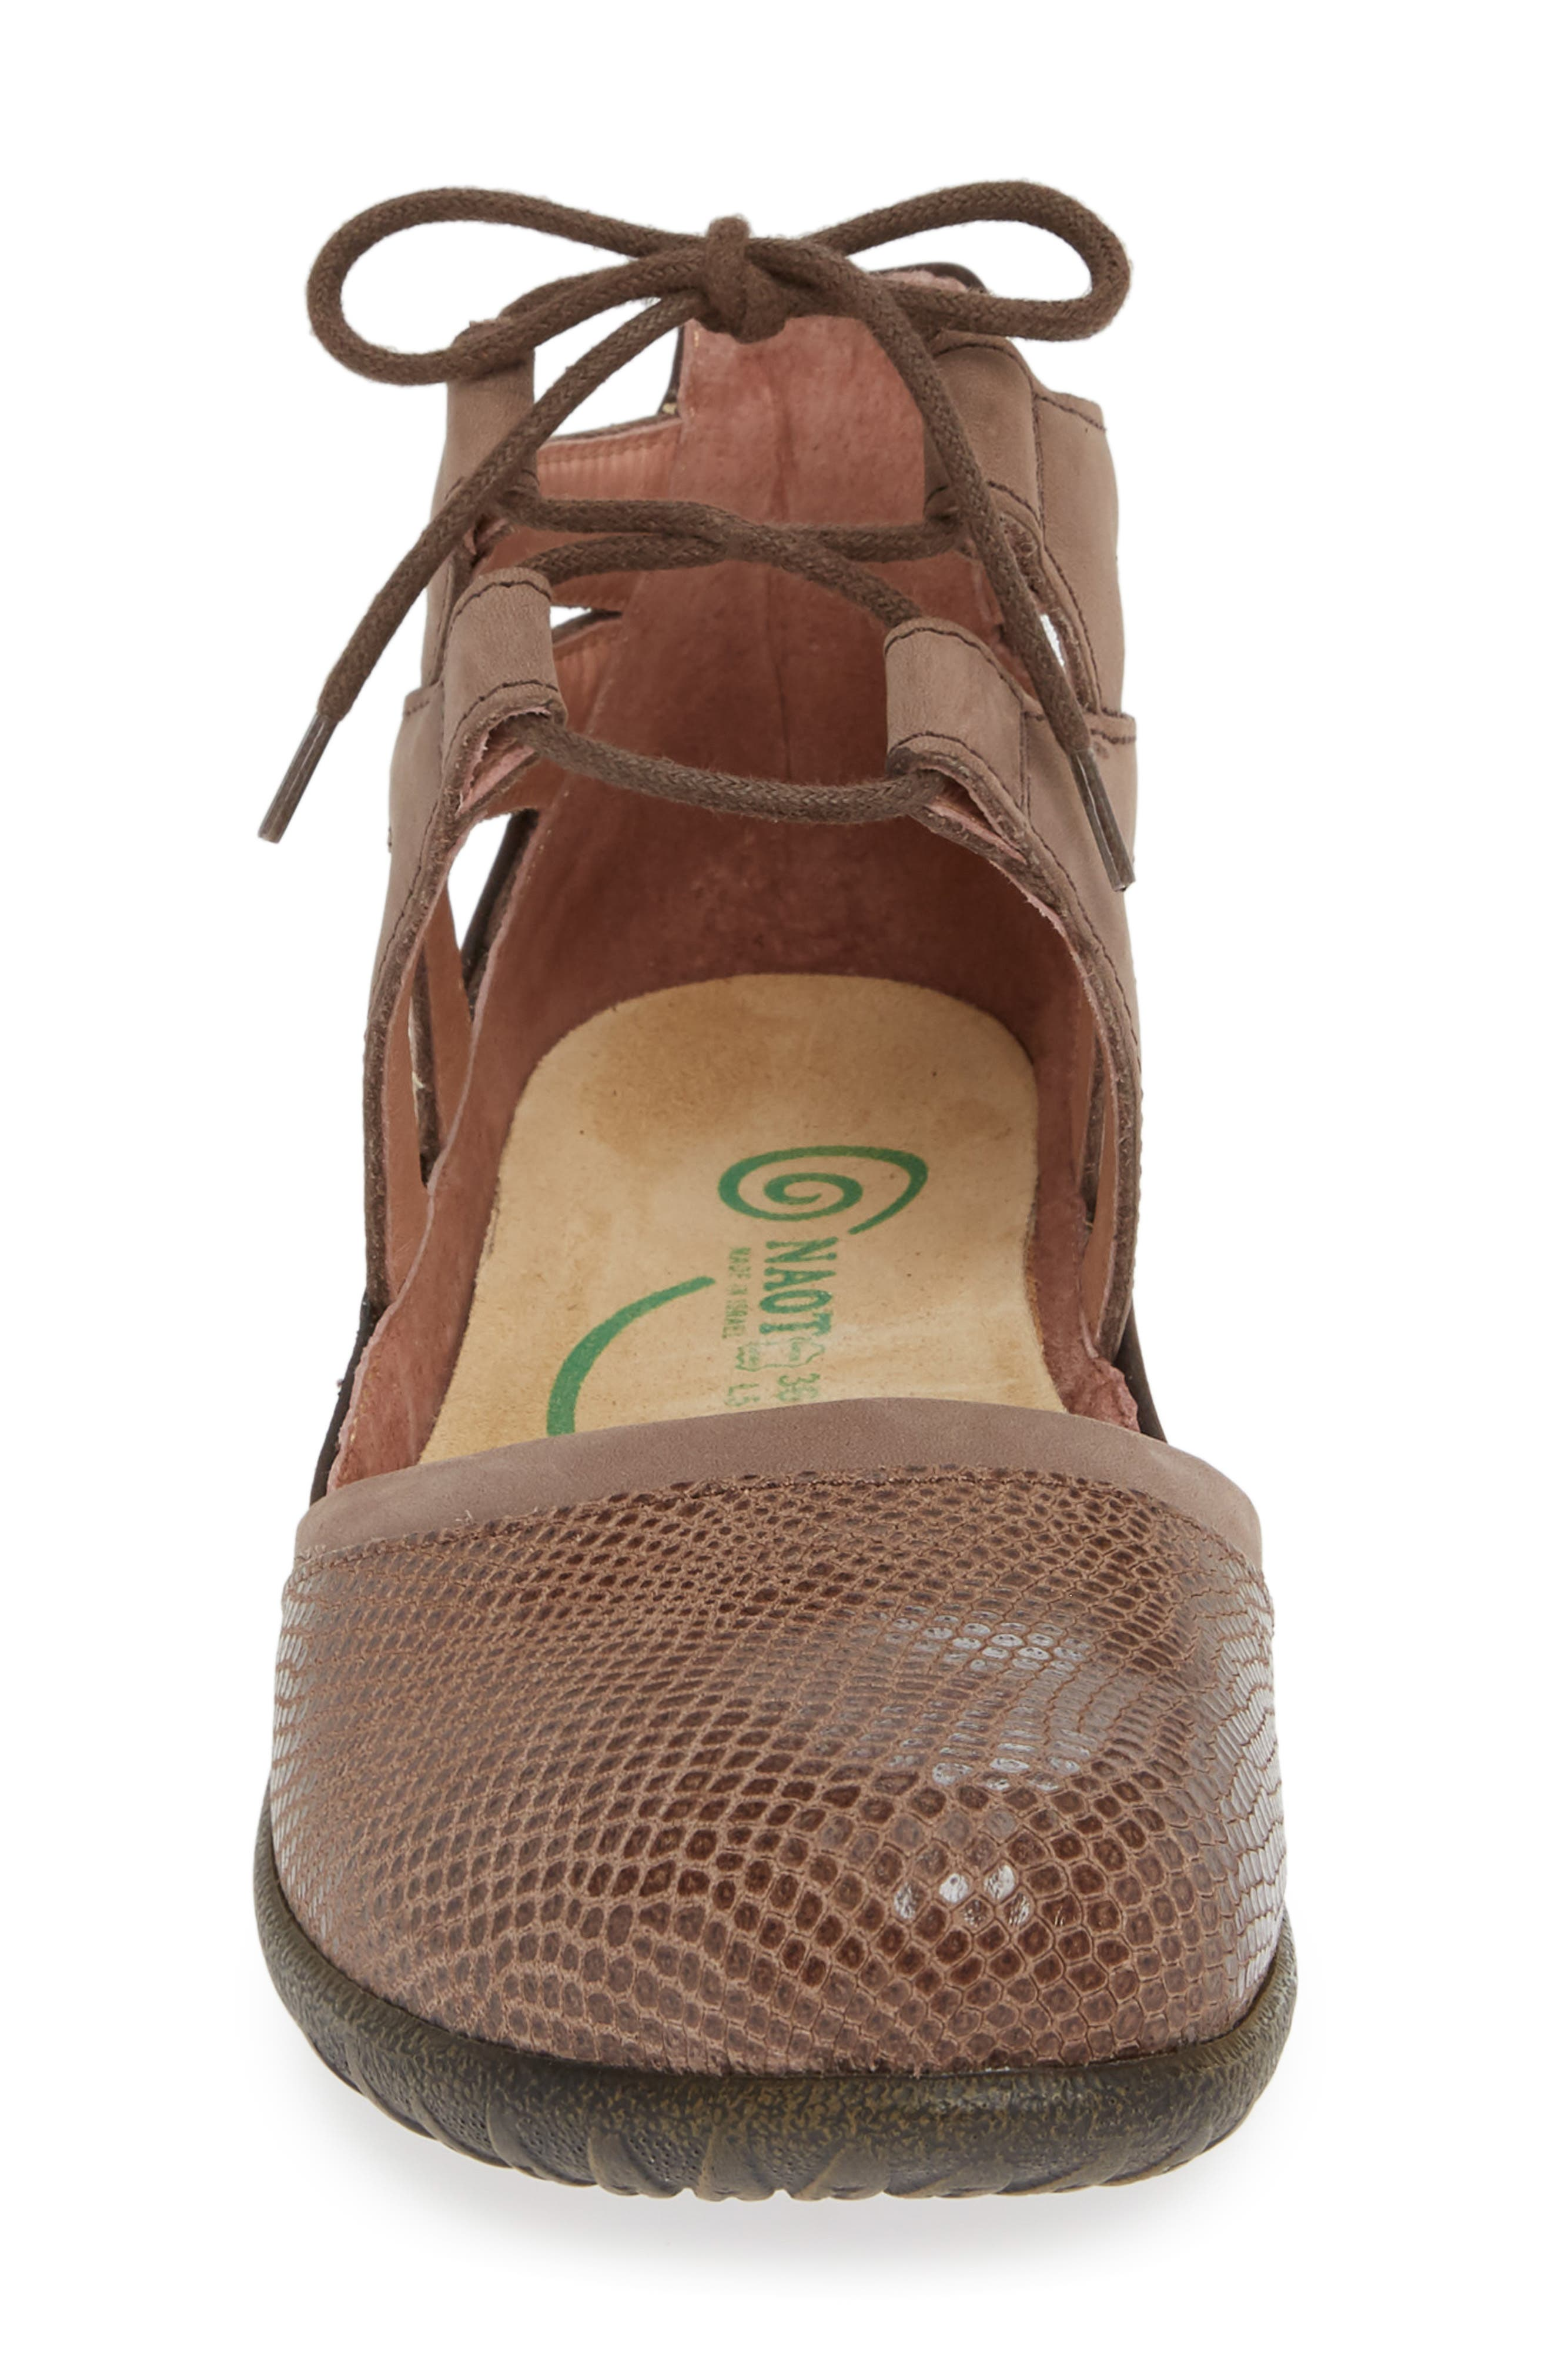 NAOT, Kata Lace-Up Sandal, Alternate thumbnail 4, color, BROWN/ SHIITAKE LEATHER